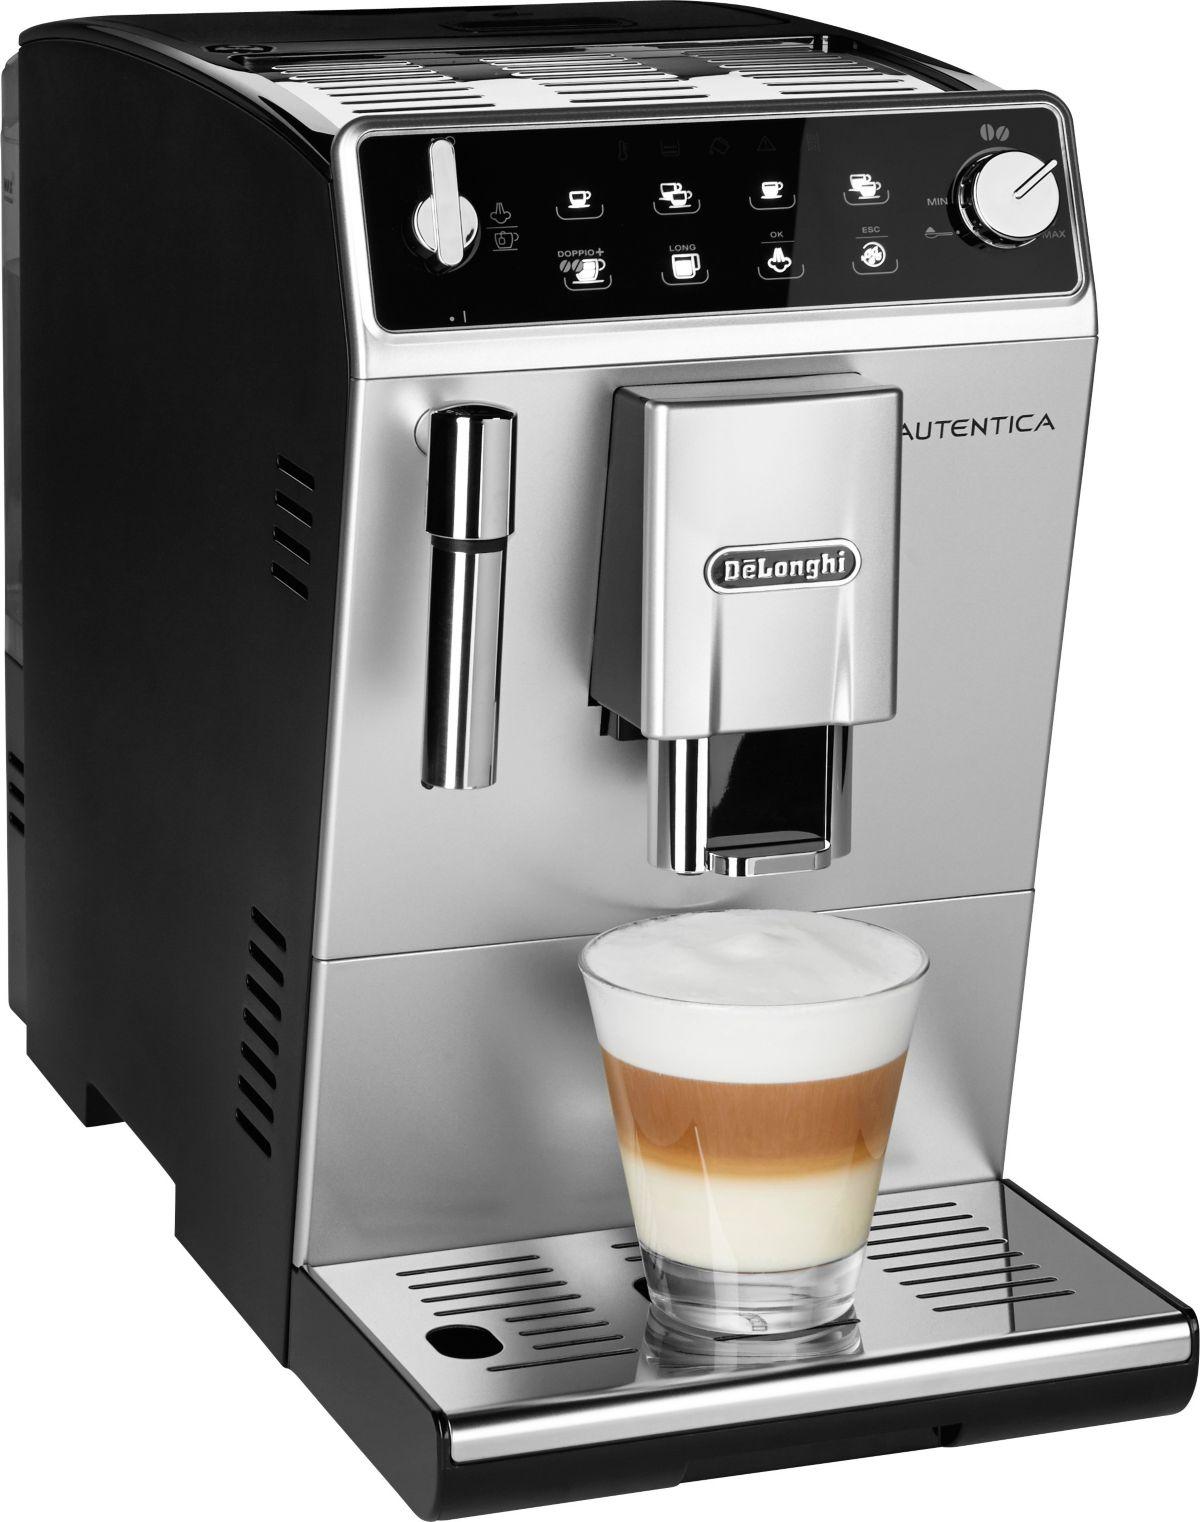 delonghi ecam 28 466 mb primadonna s kaffeevollautomat edelstahl schwarz. Black Bedroom Furniture Sets. Home Design Ideas